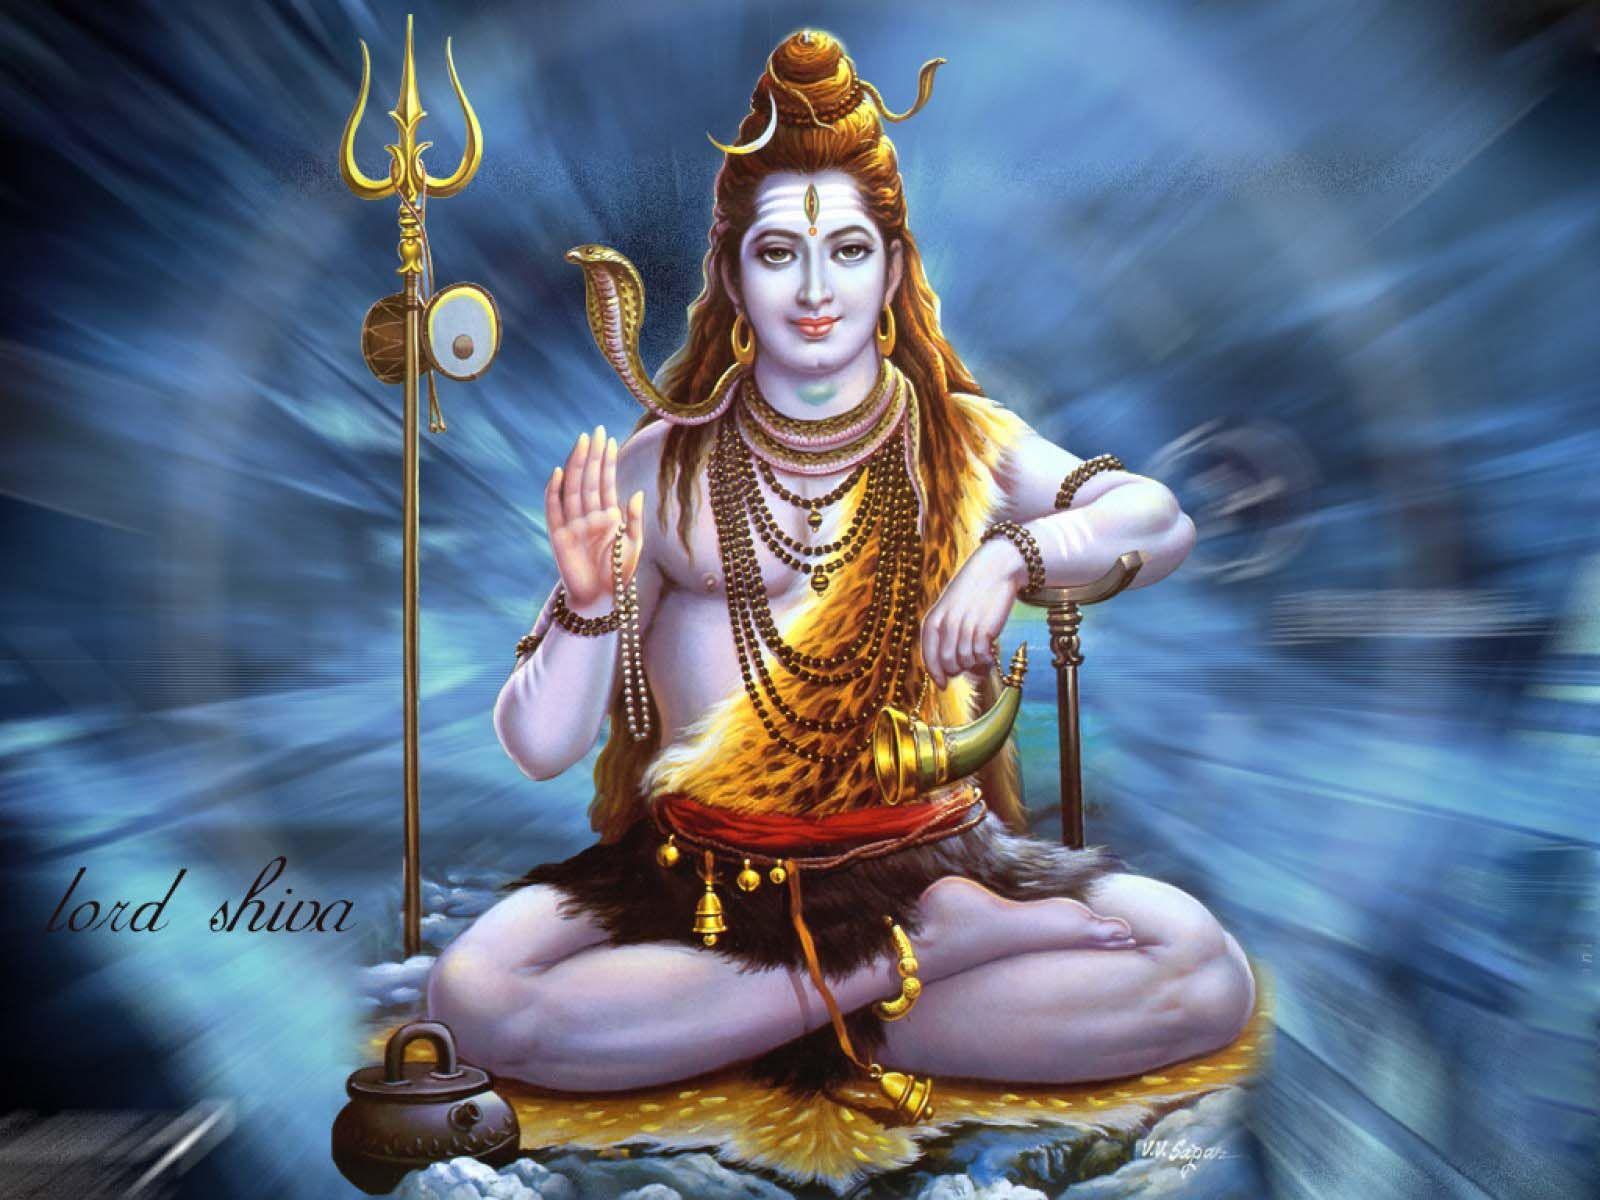 Hd wallpaper shiva - Download Lord Shiva Full Hd Wallpapers Gallery